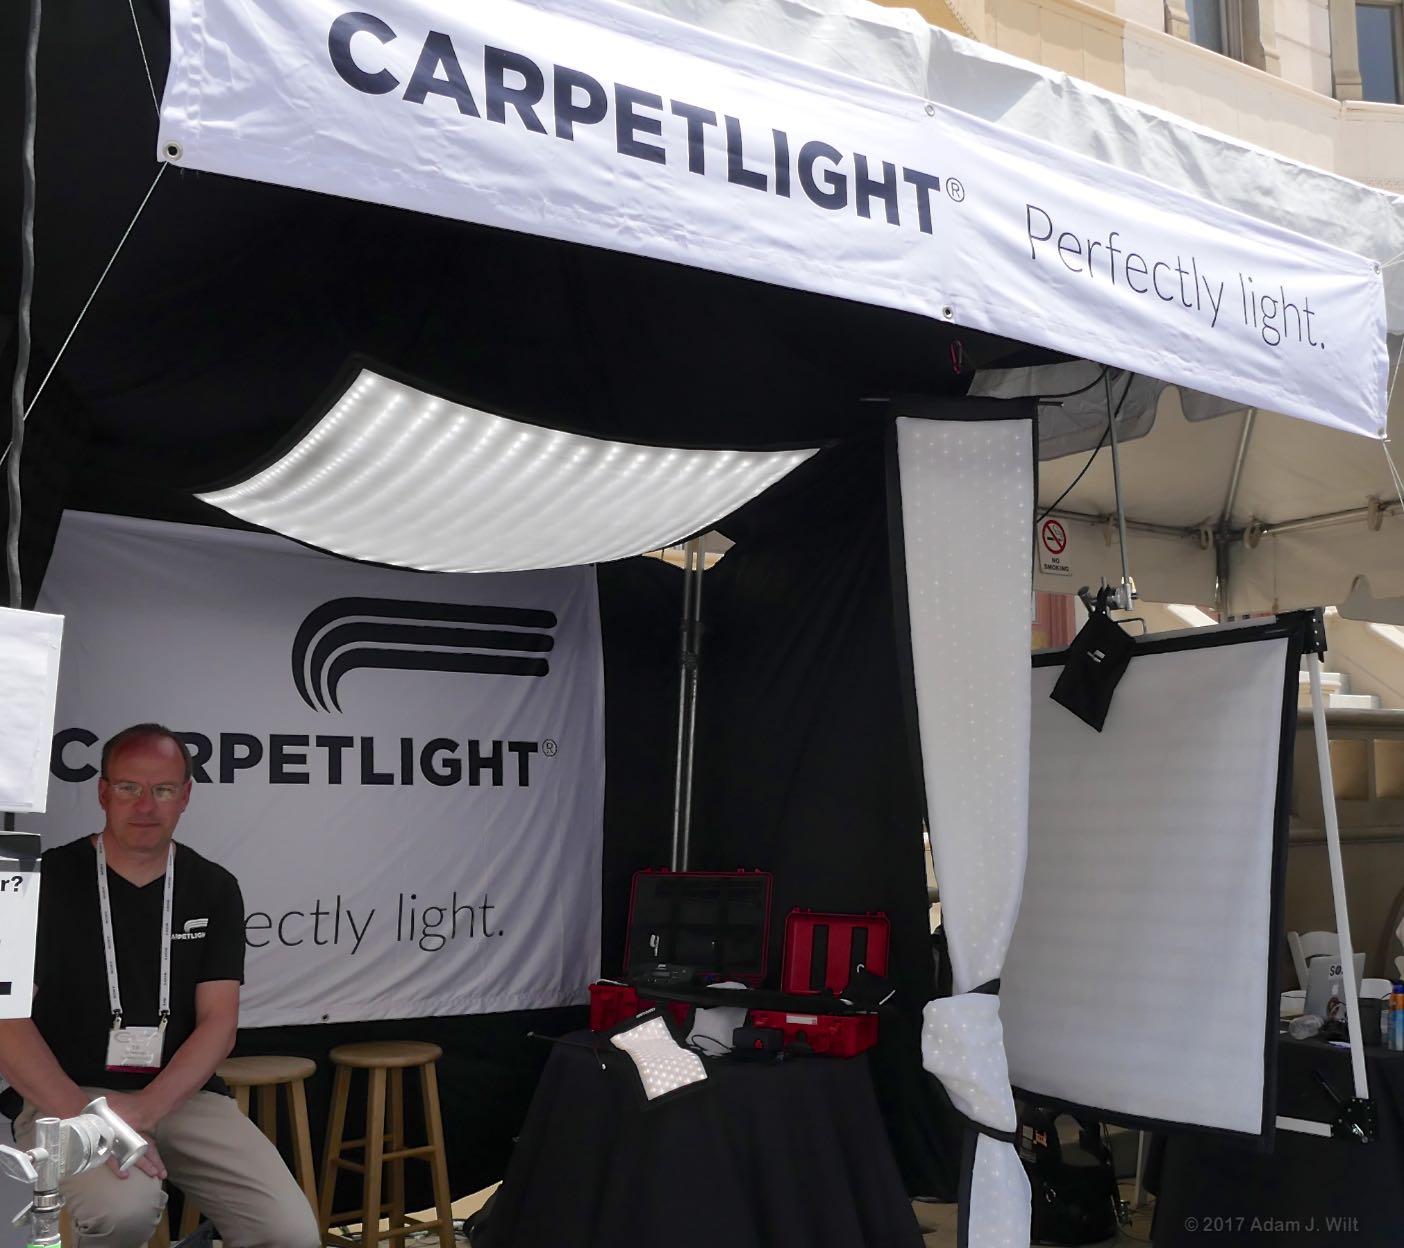 Carpetlight booth